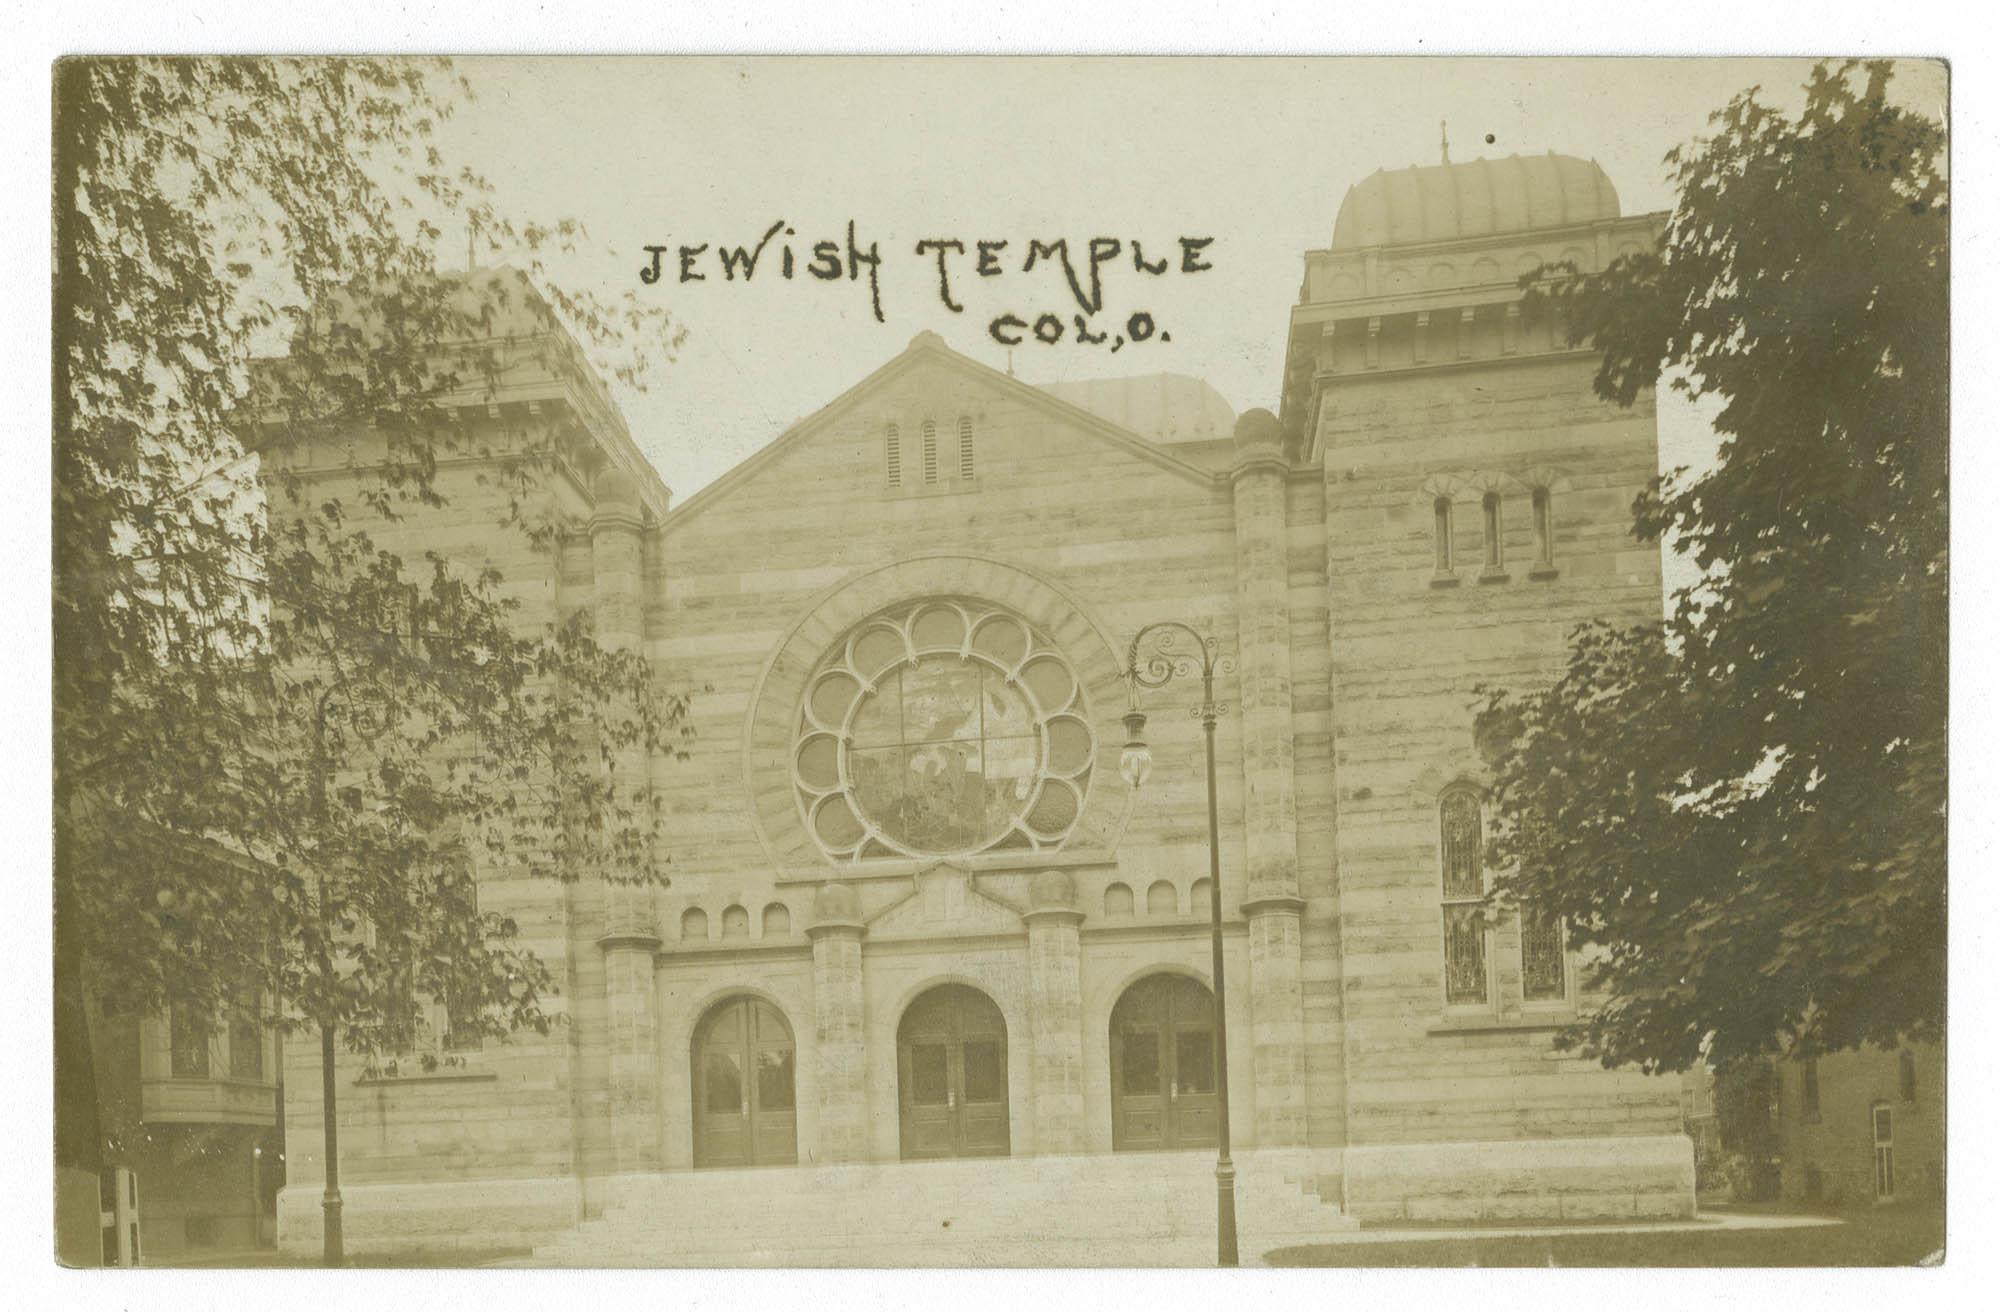 Jewish Temple, Col, O.